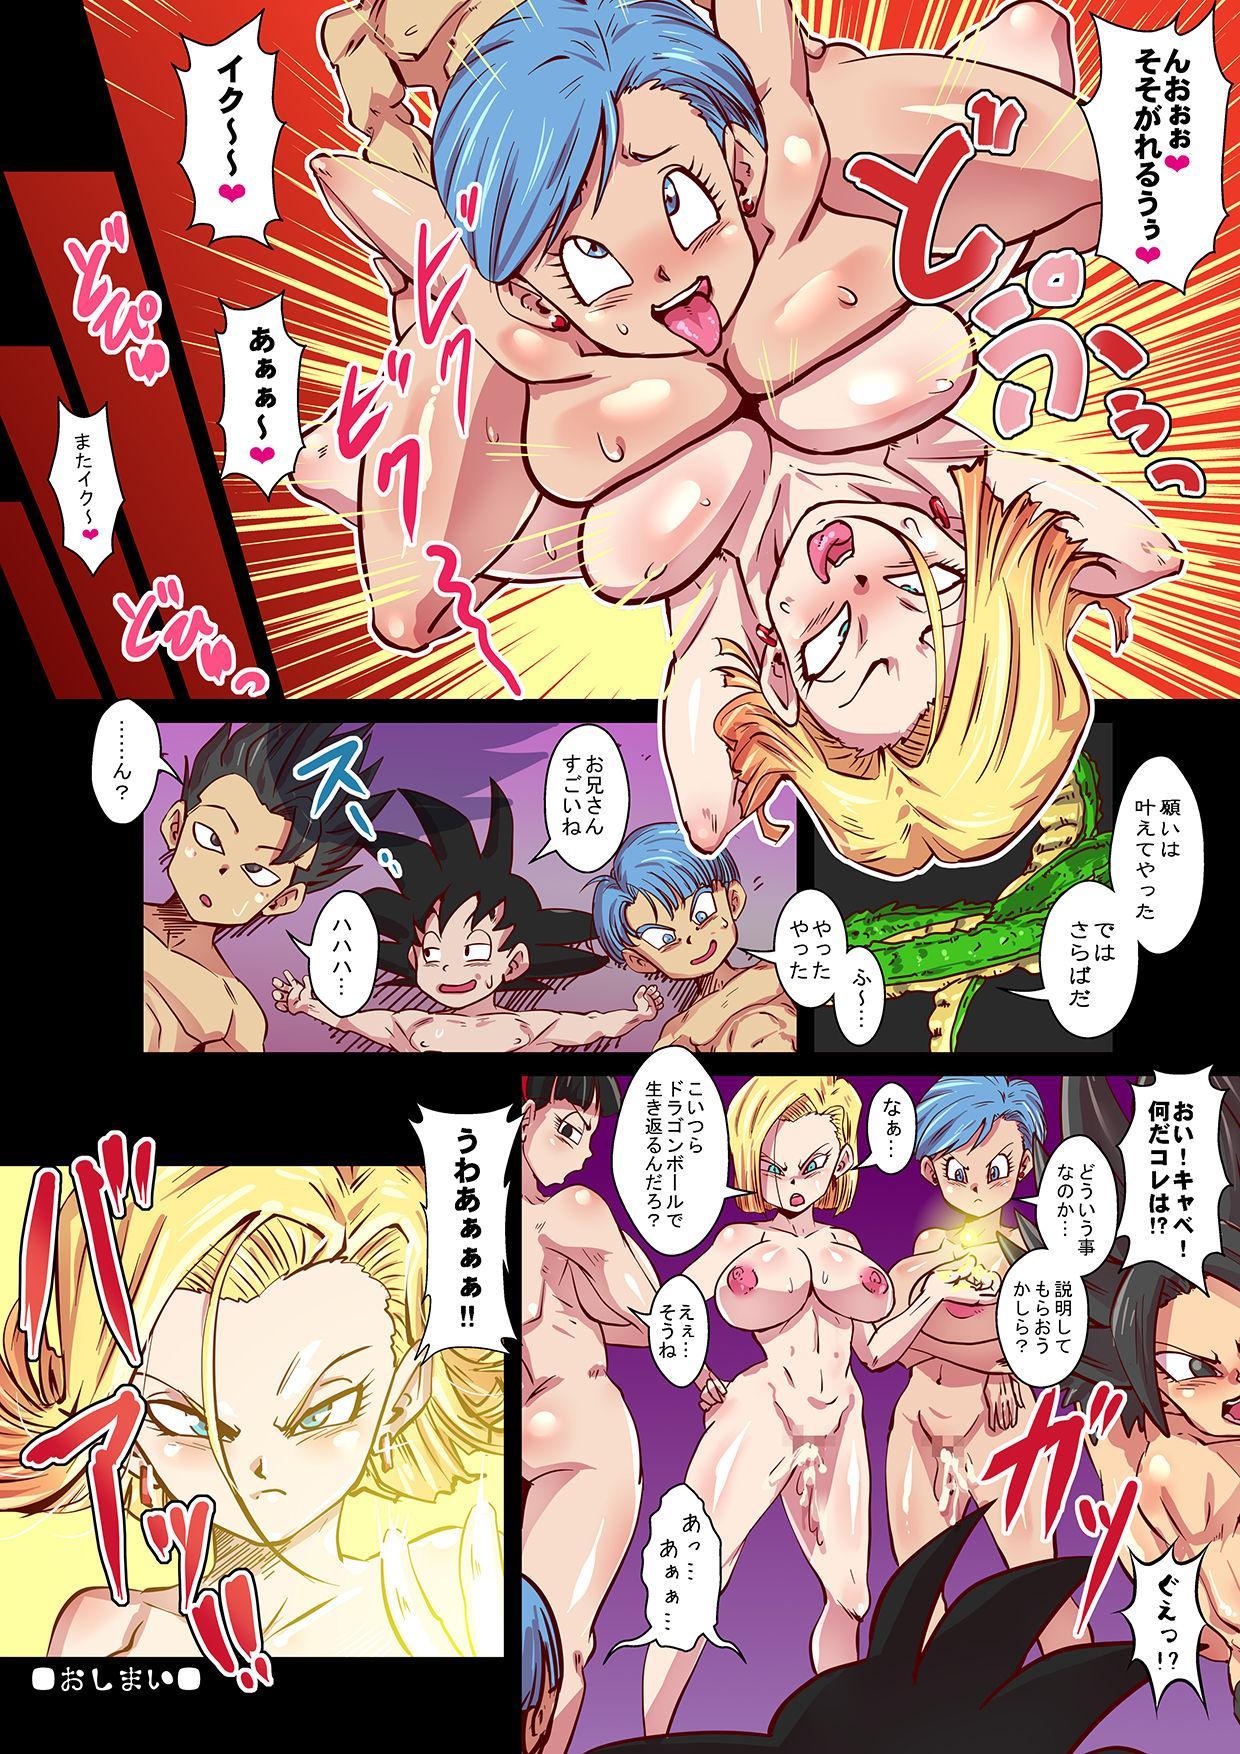 DragonParadise Minami no Shima de Hame Houdai! 14